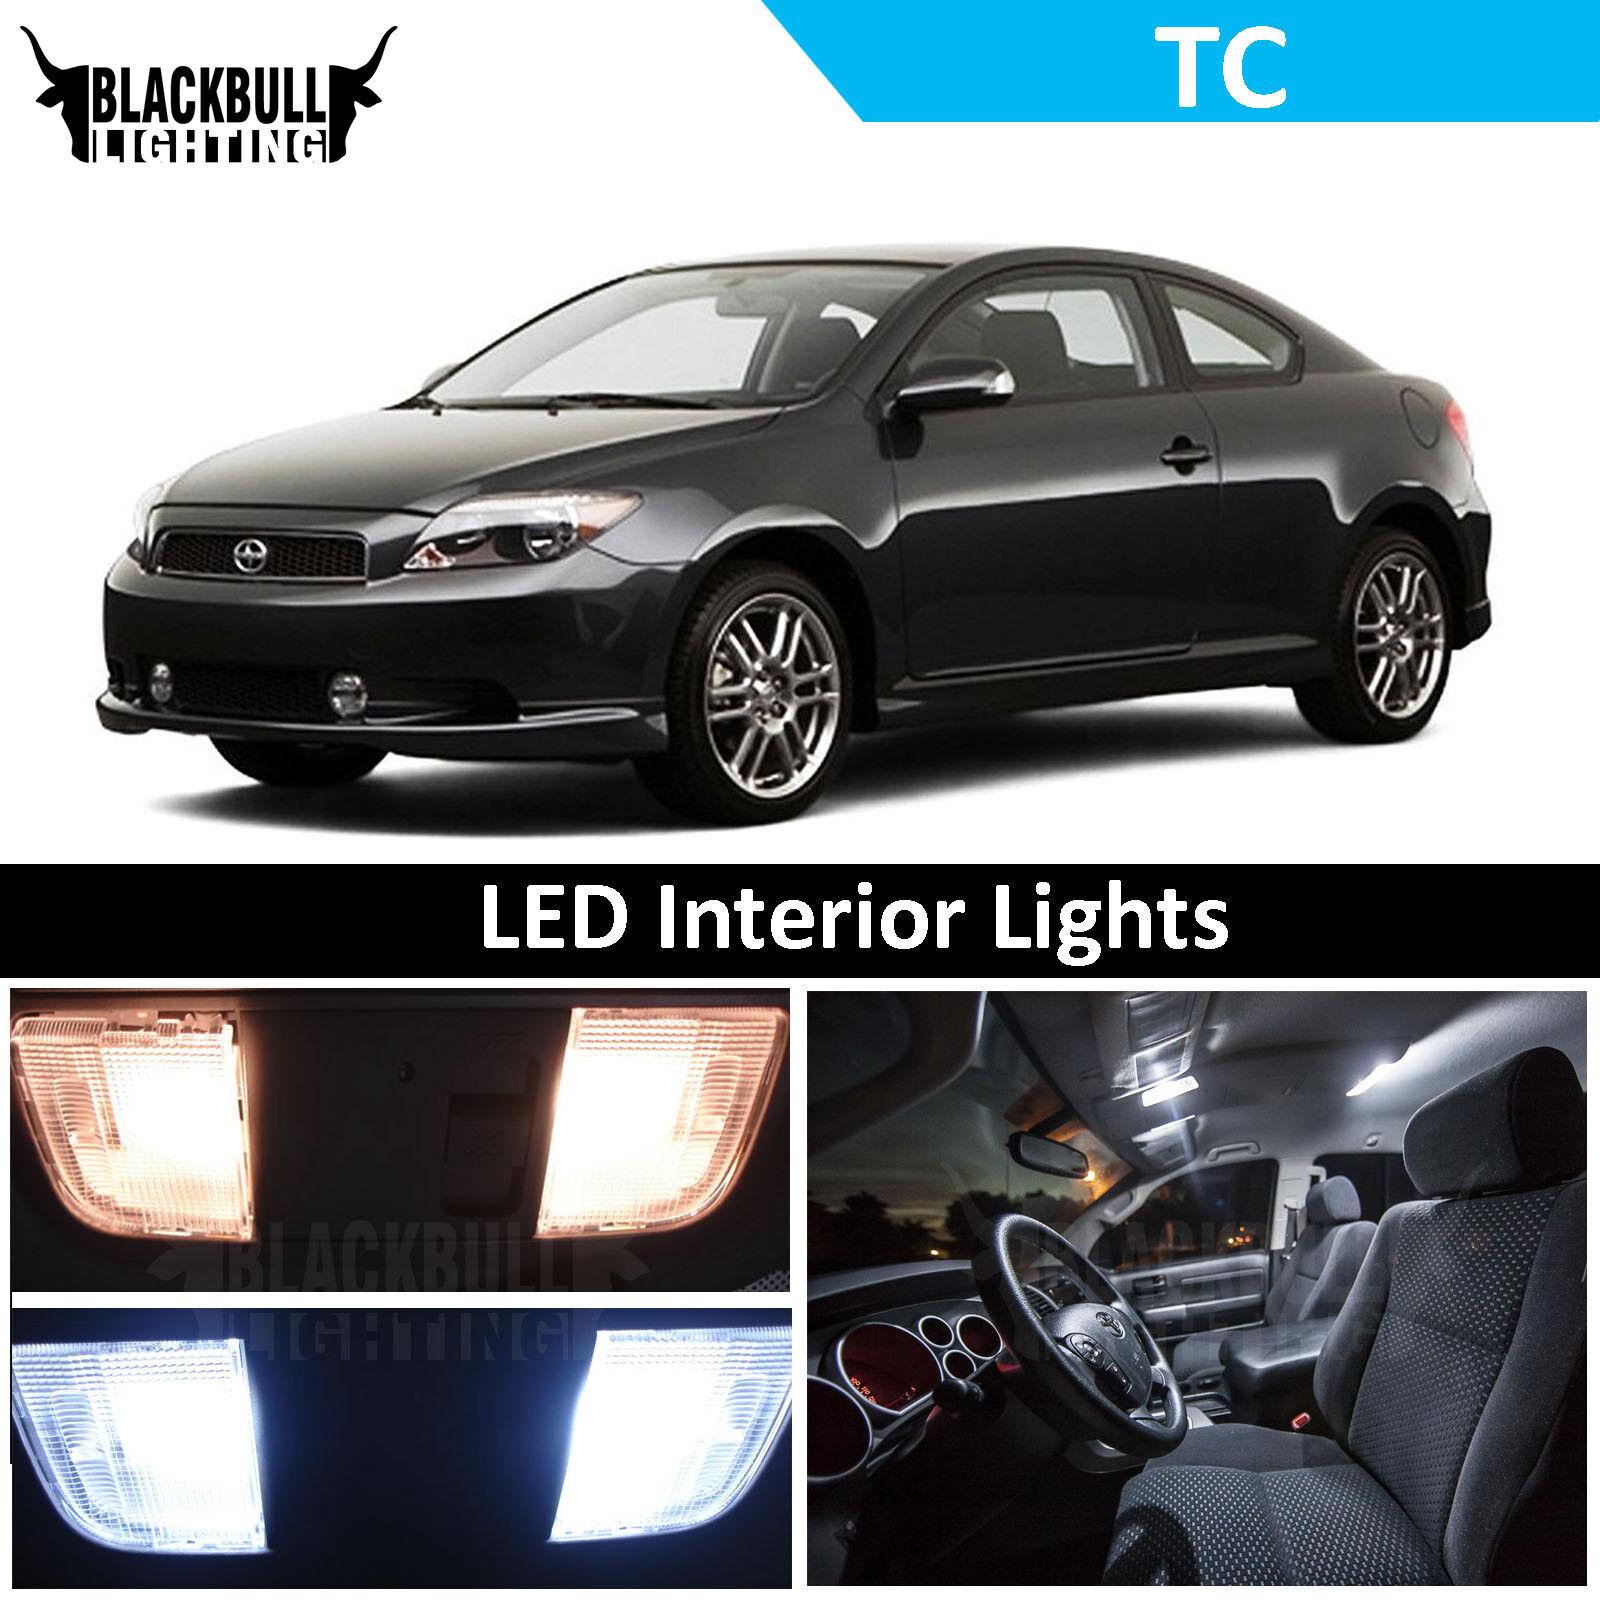 7 Pieces Classy Autos Scion tC Interior LED Package